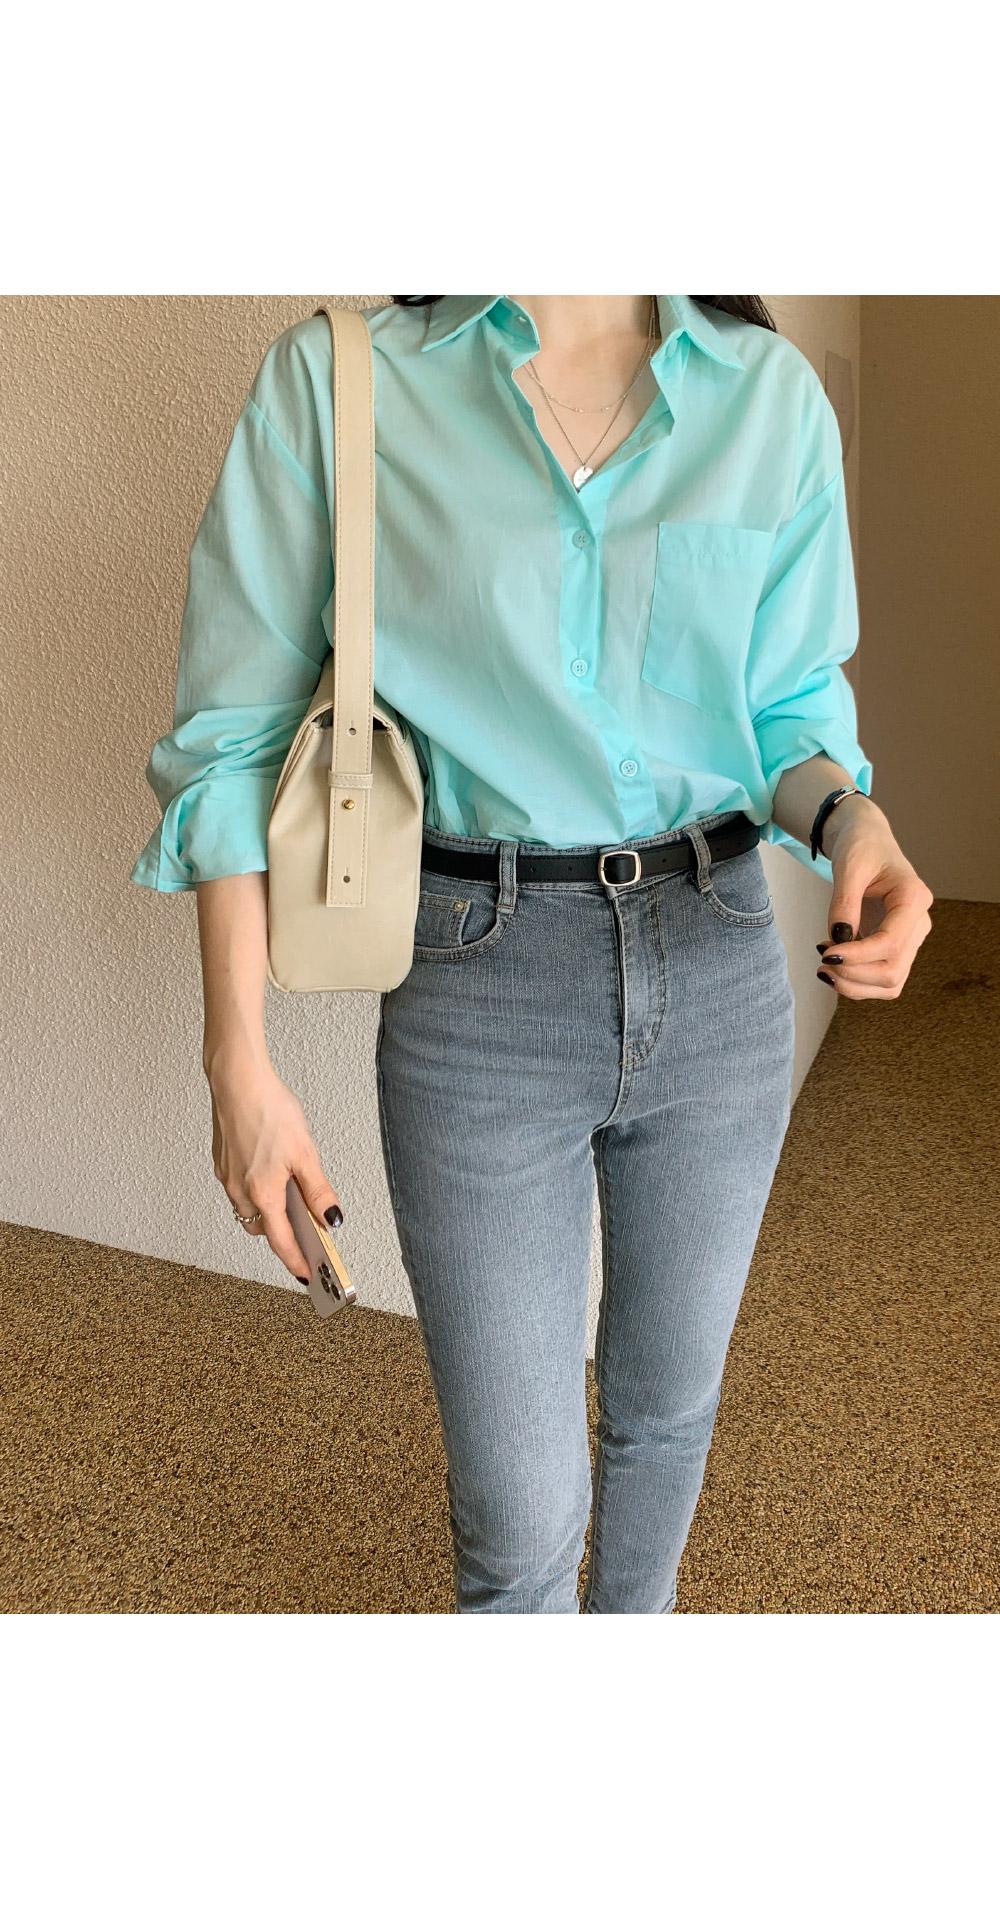 Clock shoulder bag